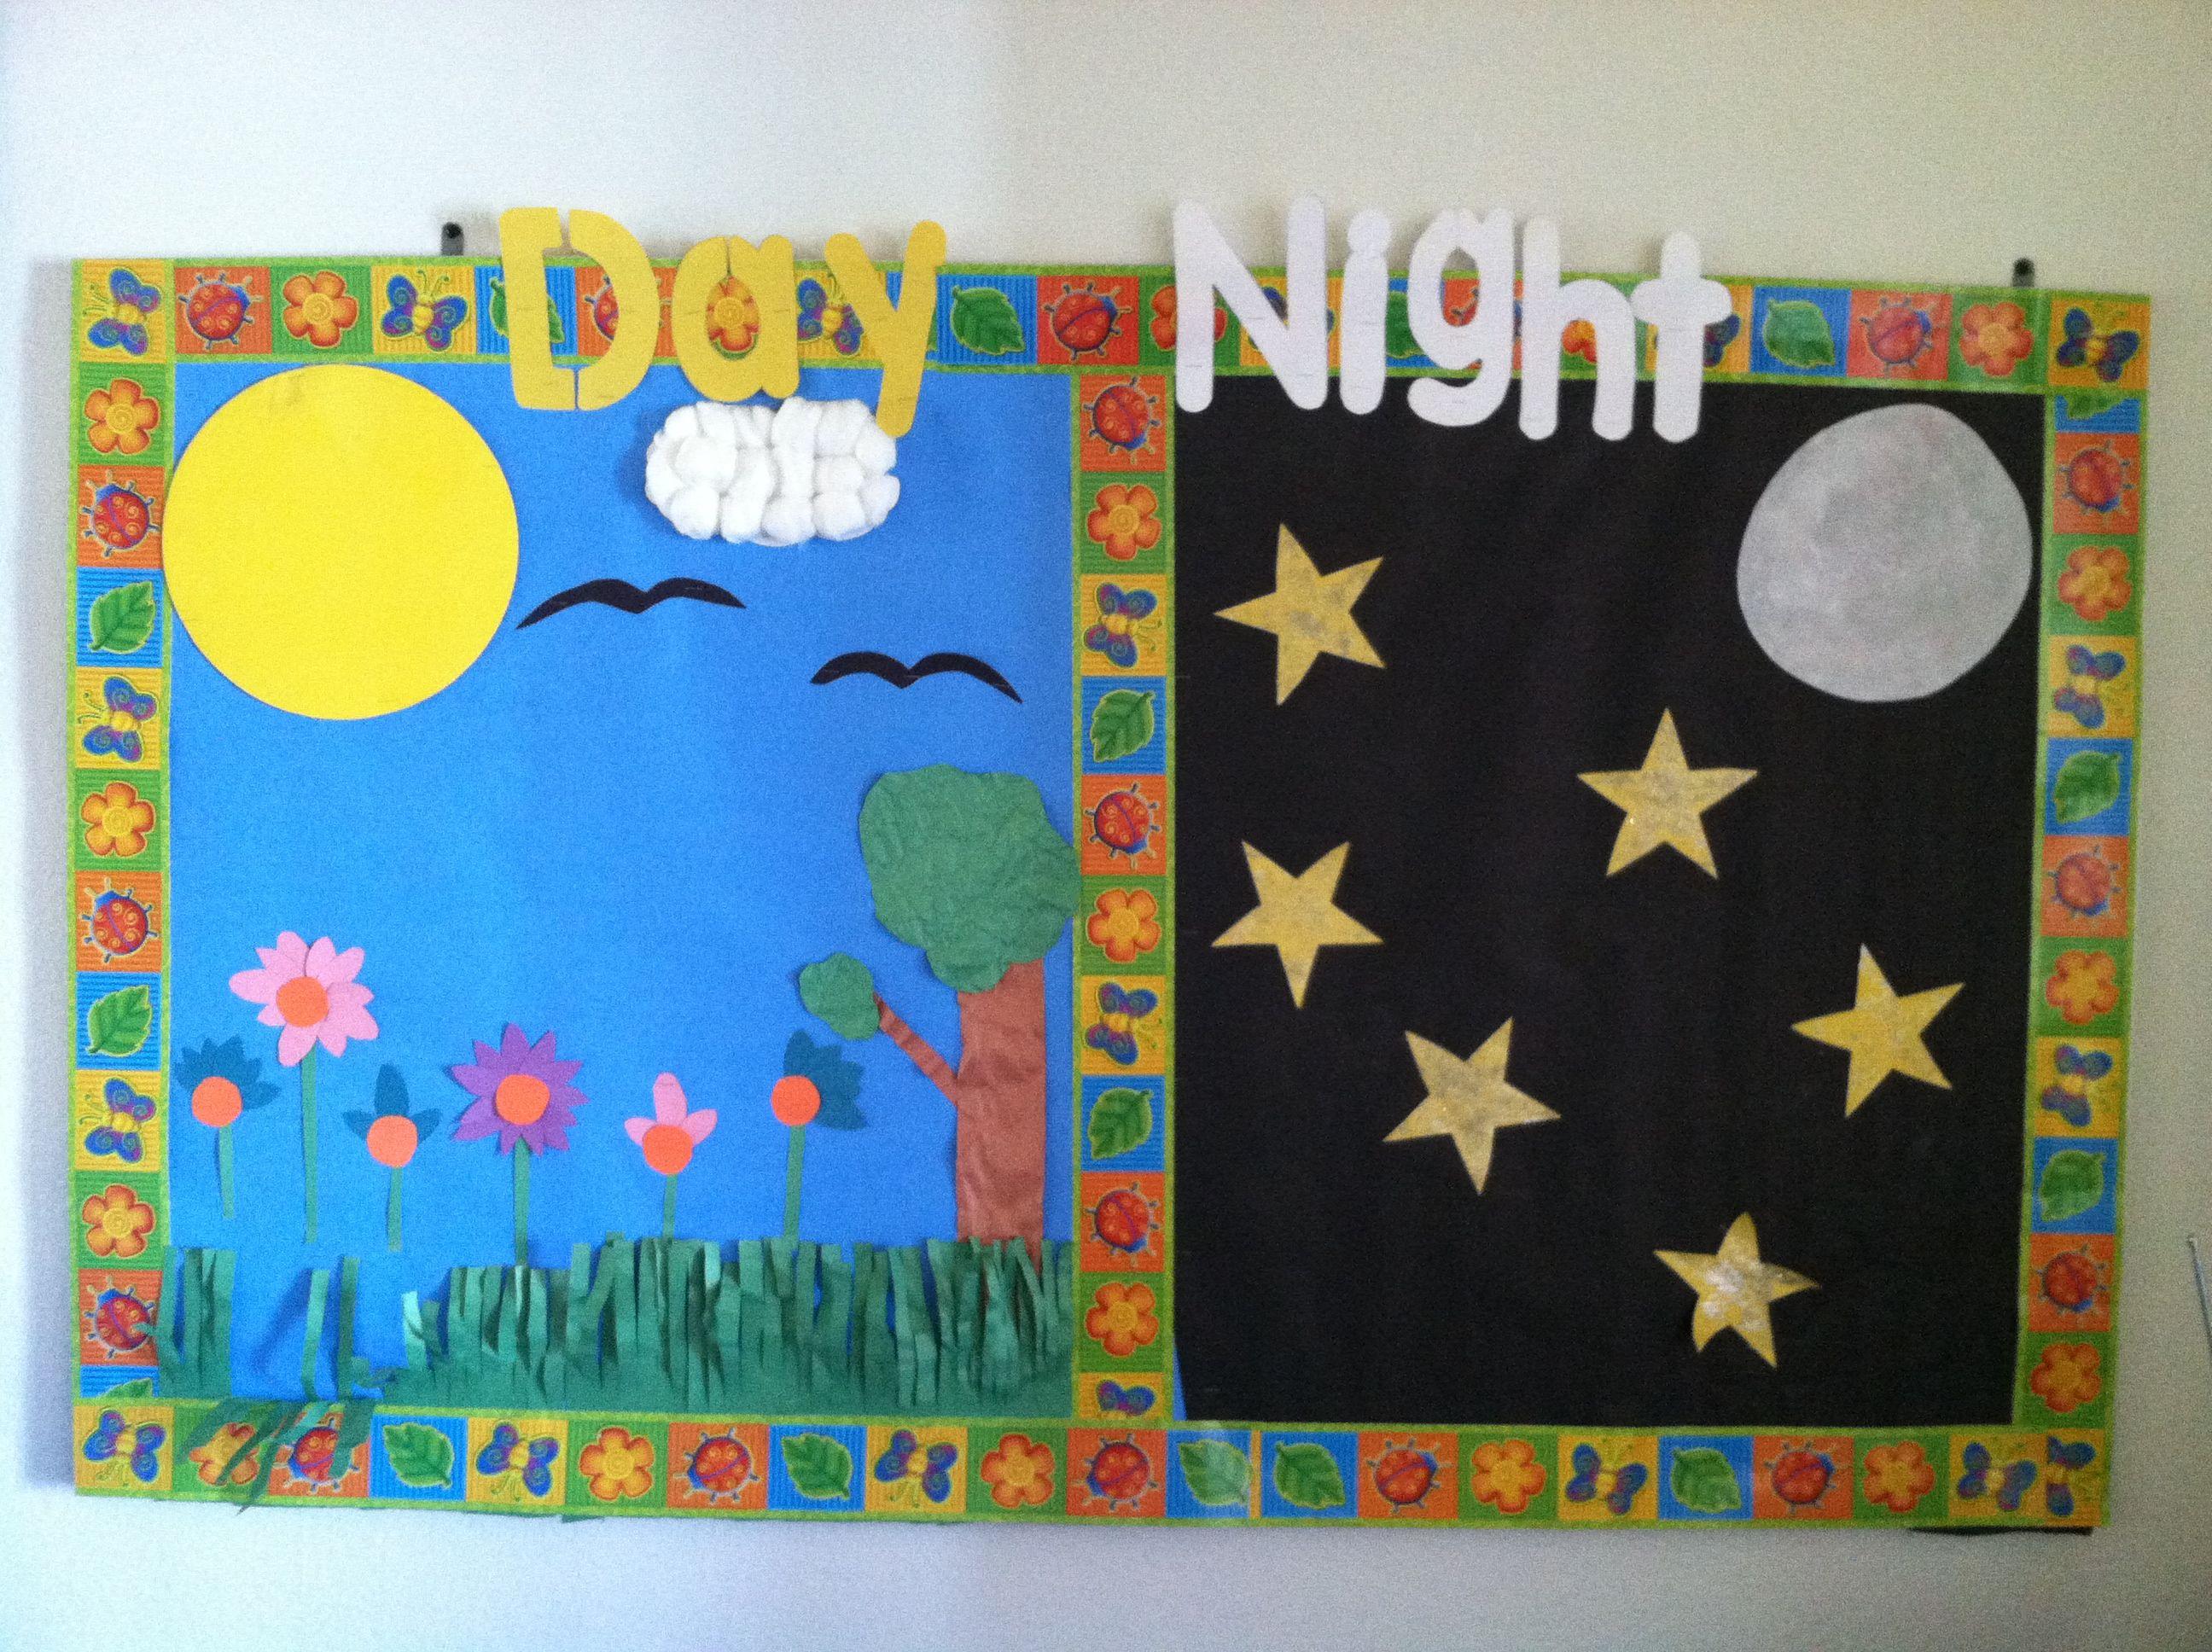 Day Night Bulletin Board By Kristin T